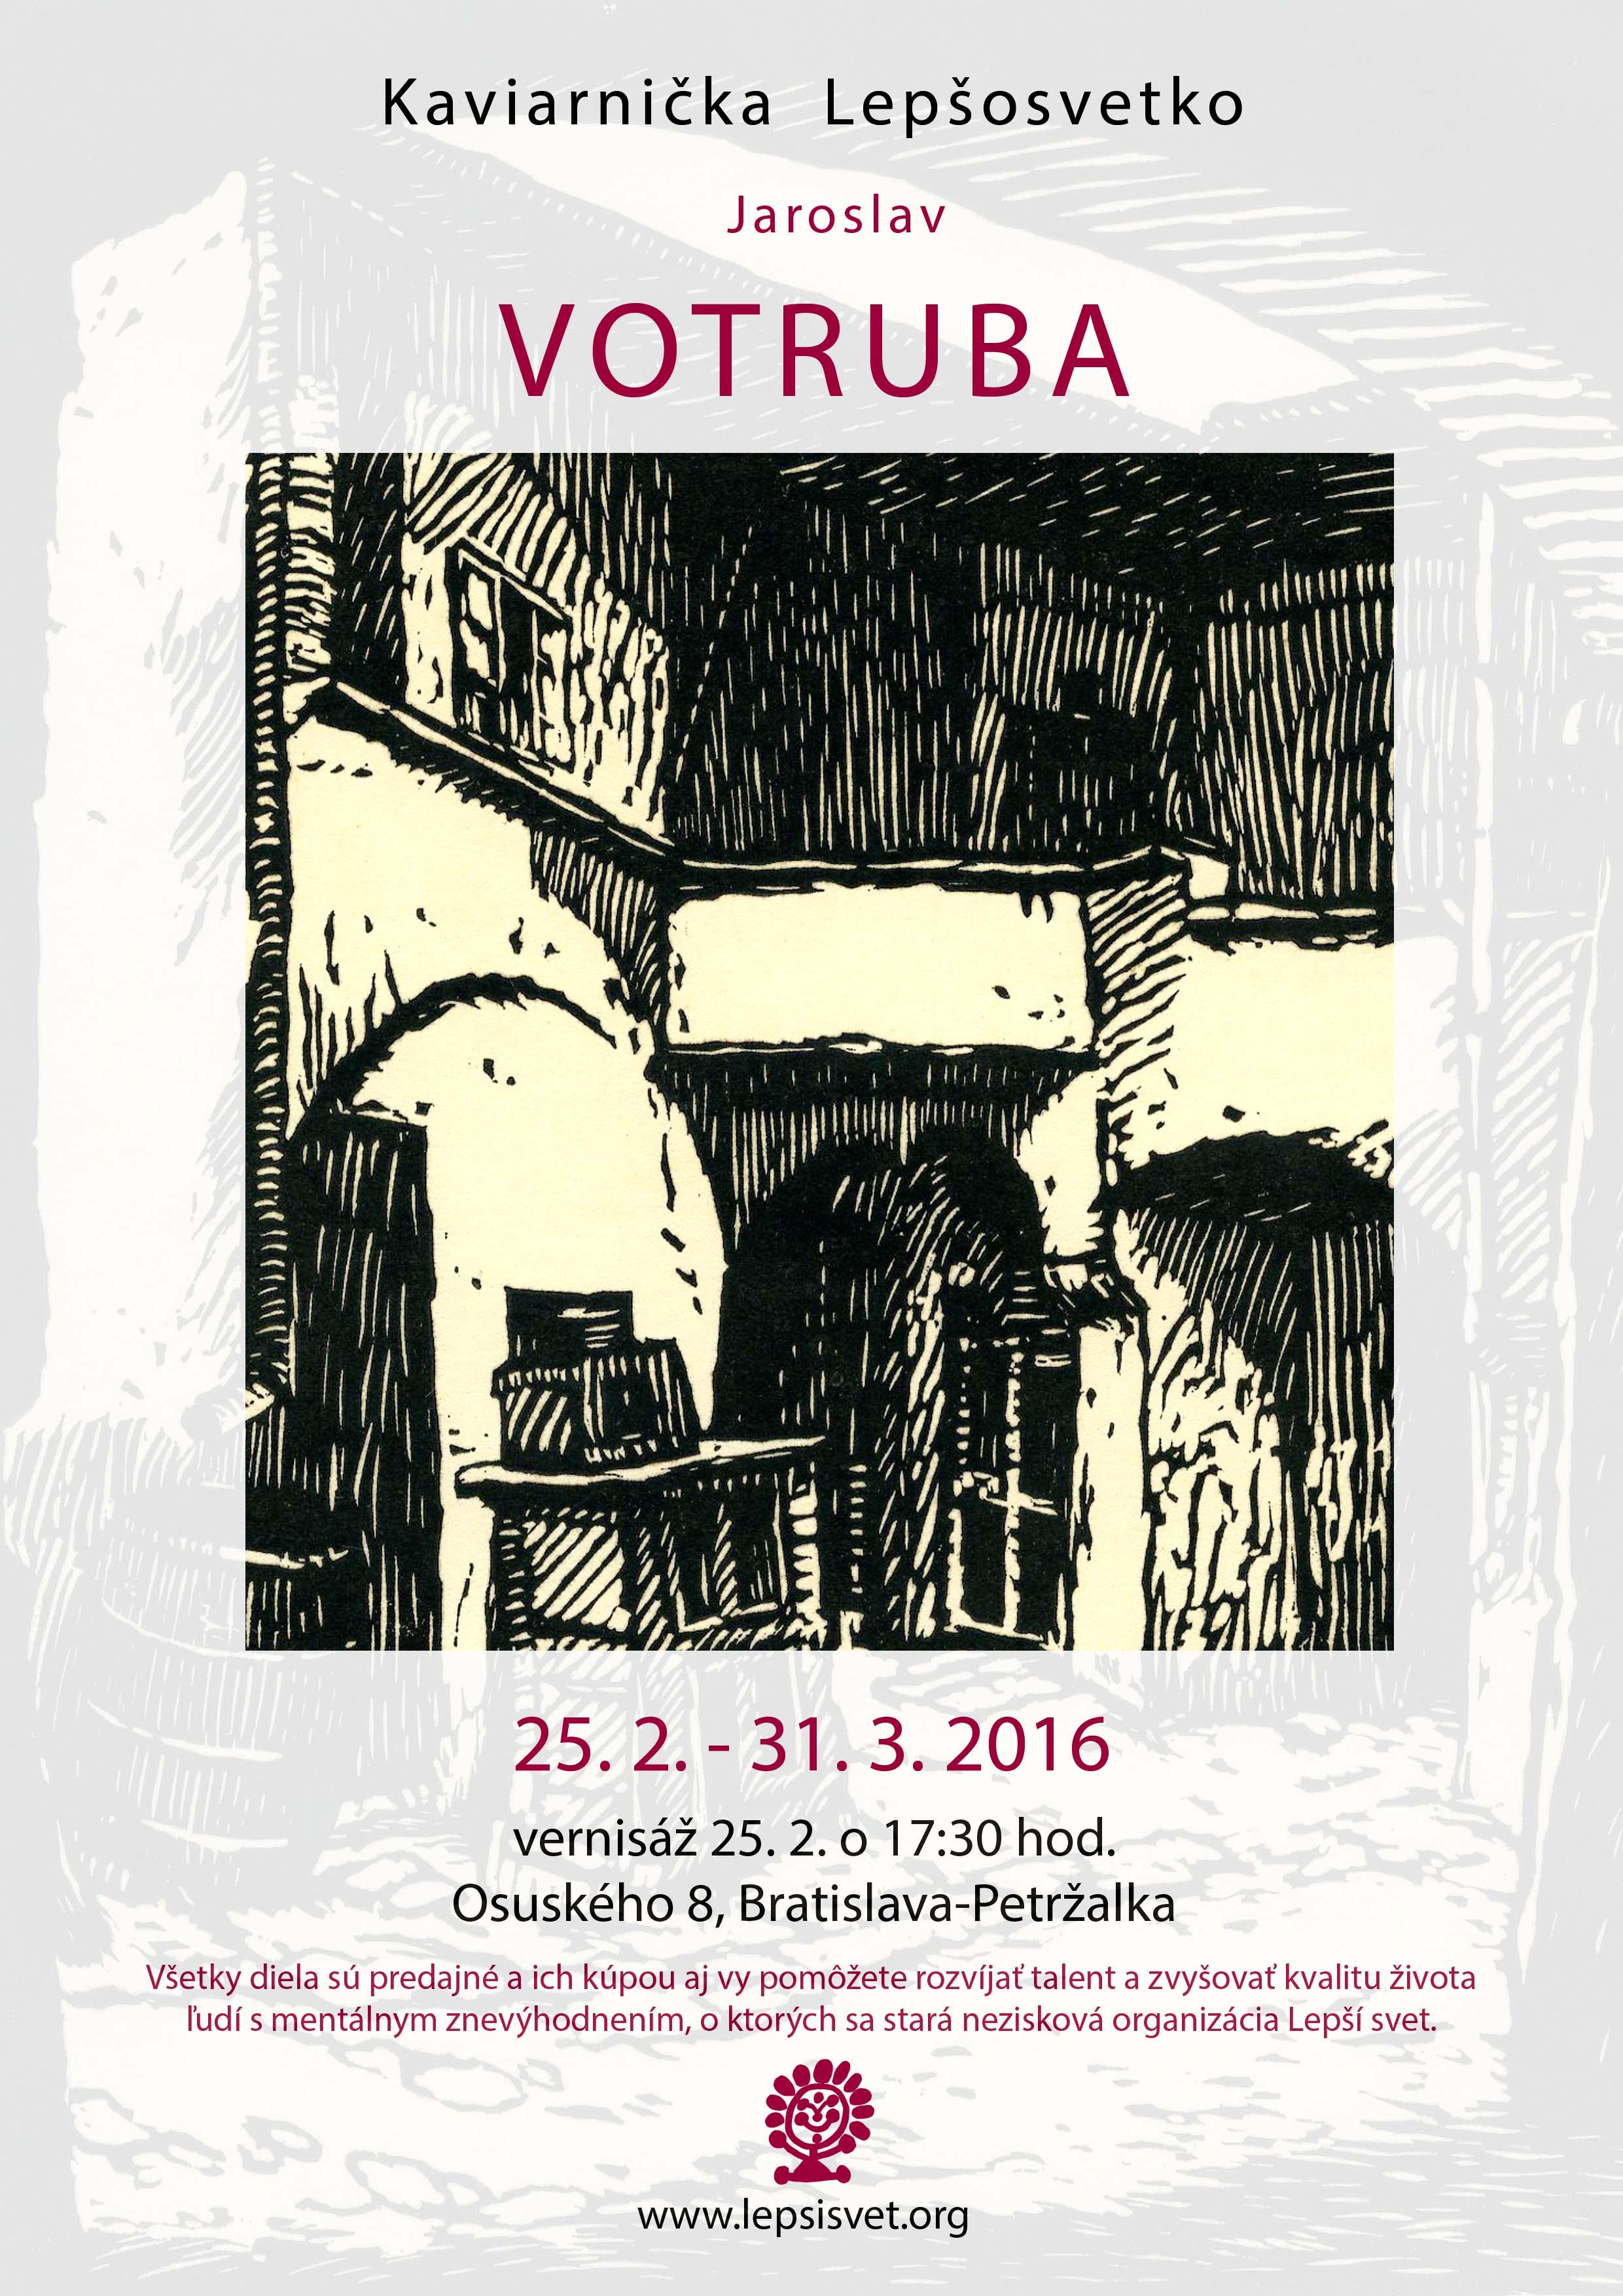 votruba2016_01 copy